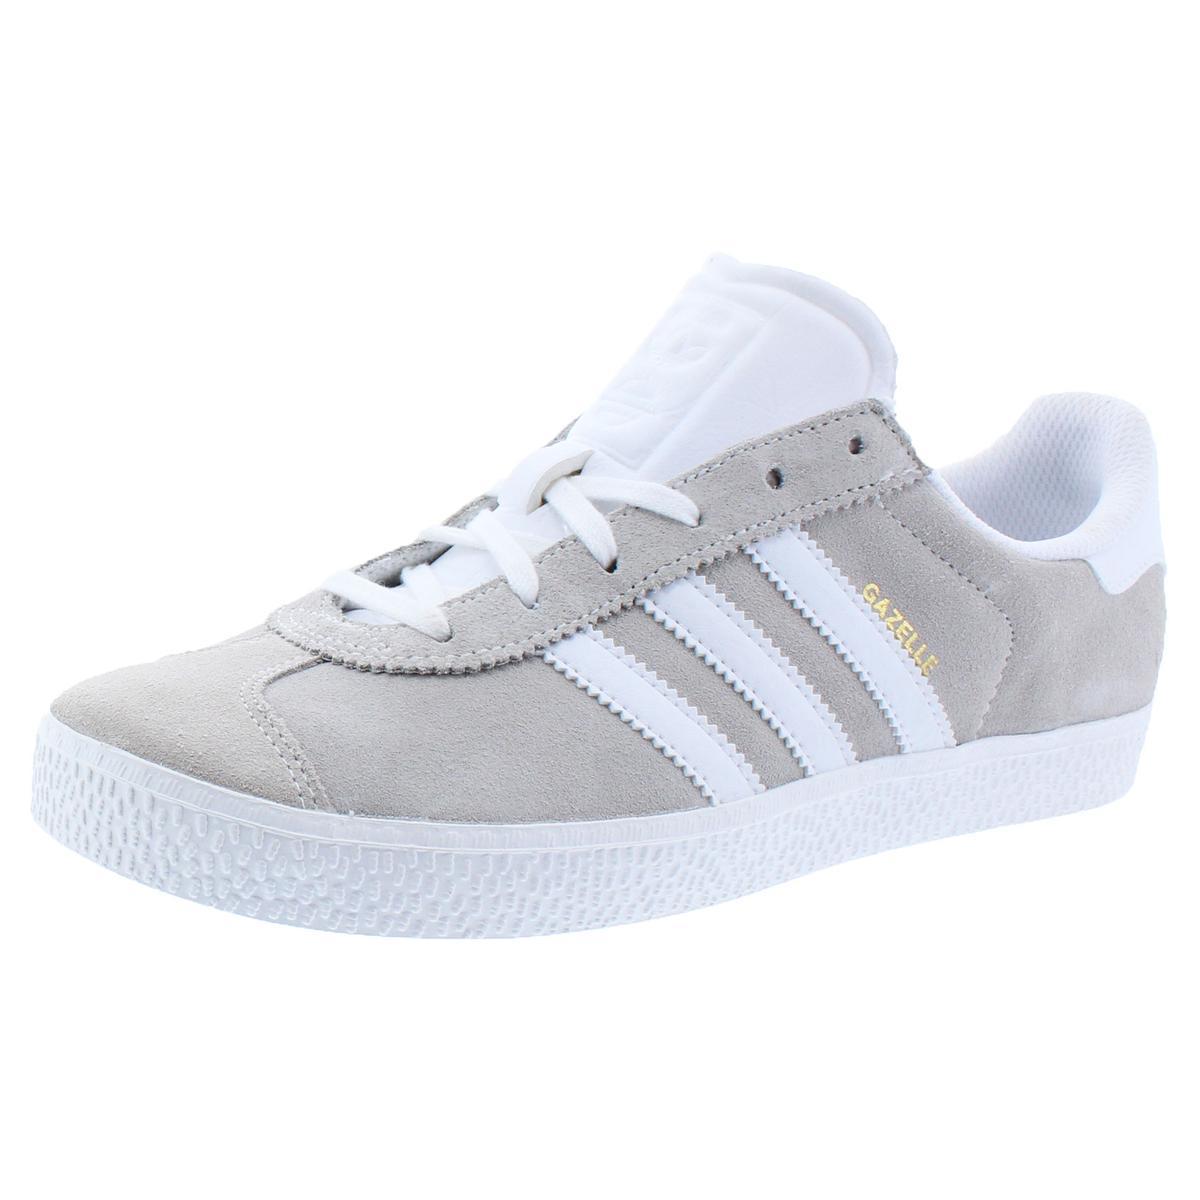 67254962888e9 Details about adidas Originals Boys Gazelle 2 Beige Fashion Sneakers 6  Medium (D) Big Kid 3411